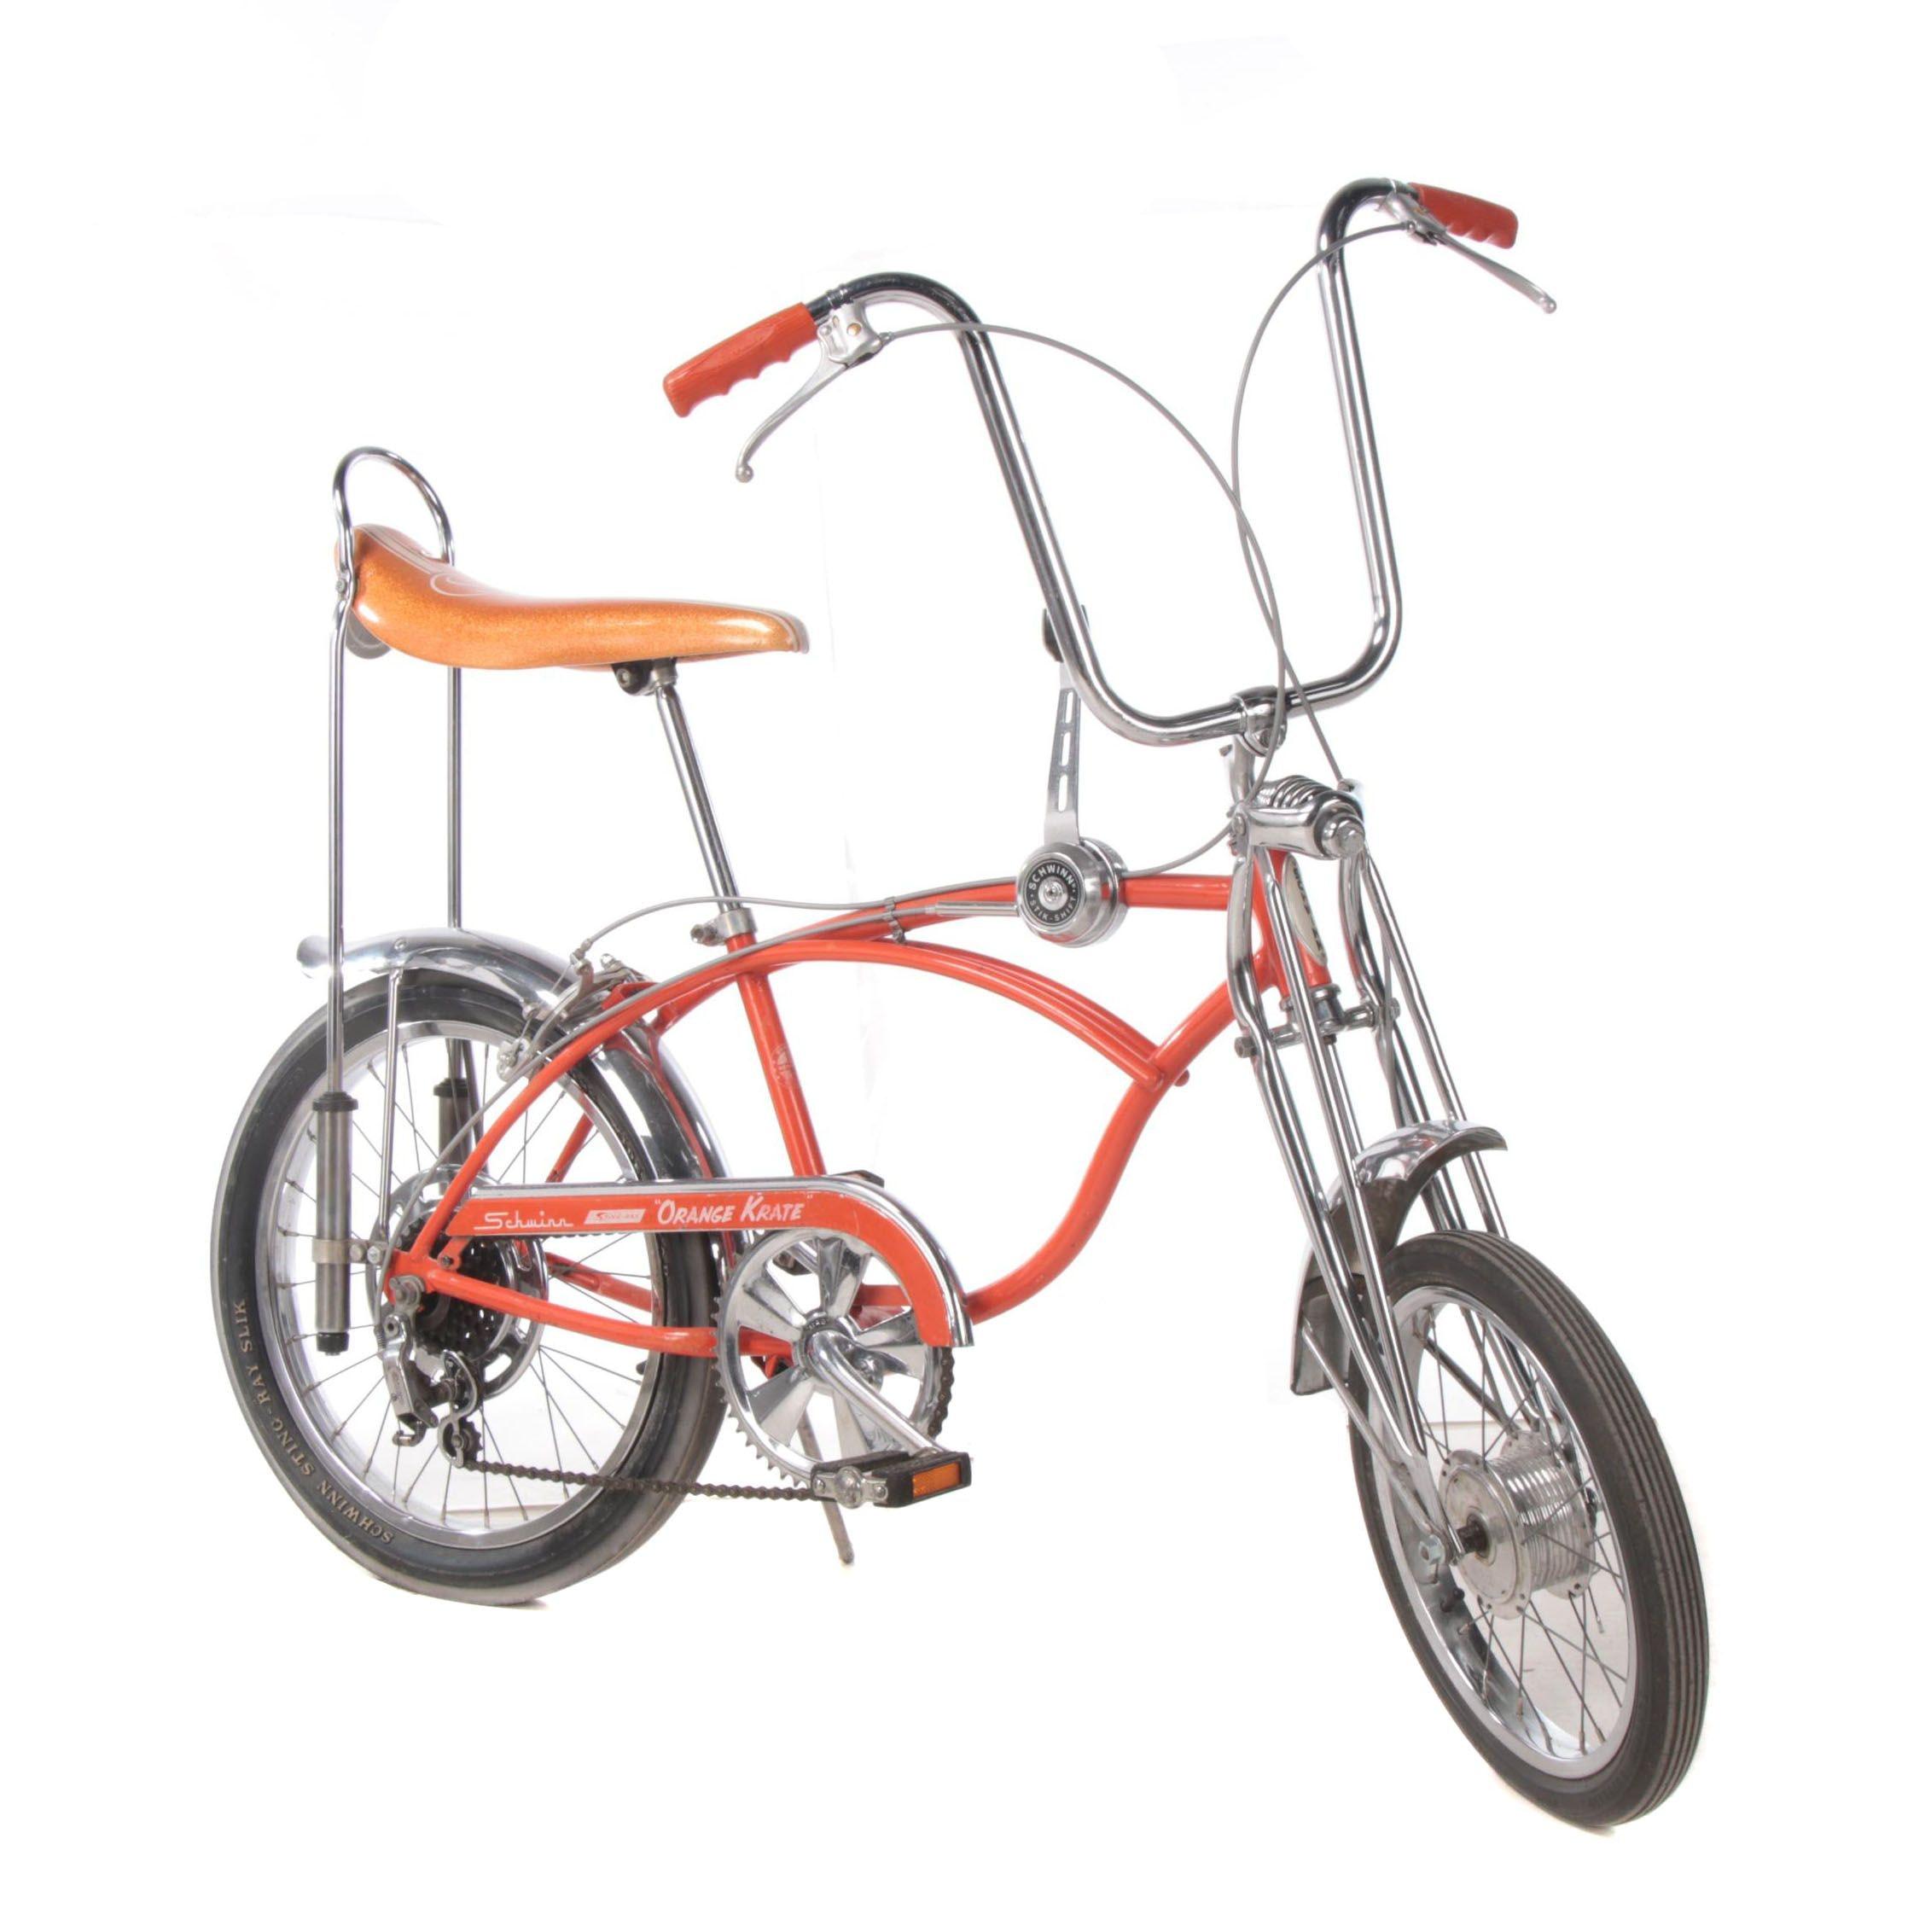 "Schwinn ""Stingray"" Orange Krate  Five-Speed Cruiser Bike, 1968-1971"